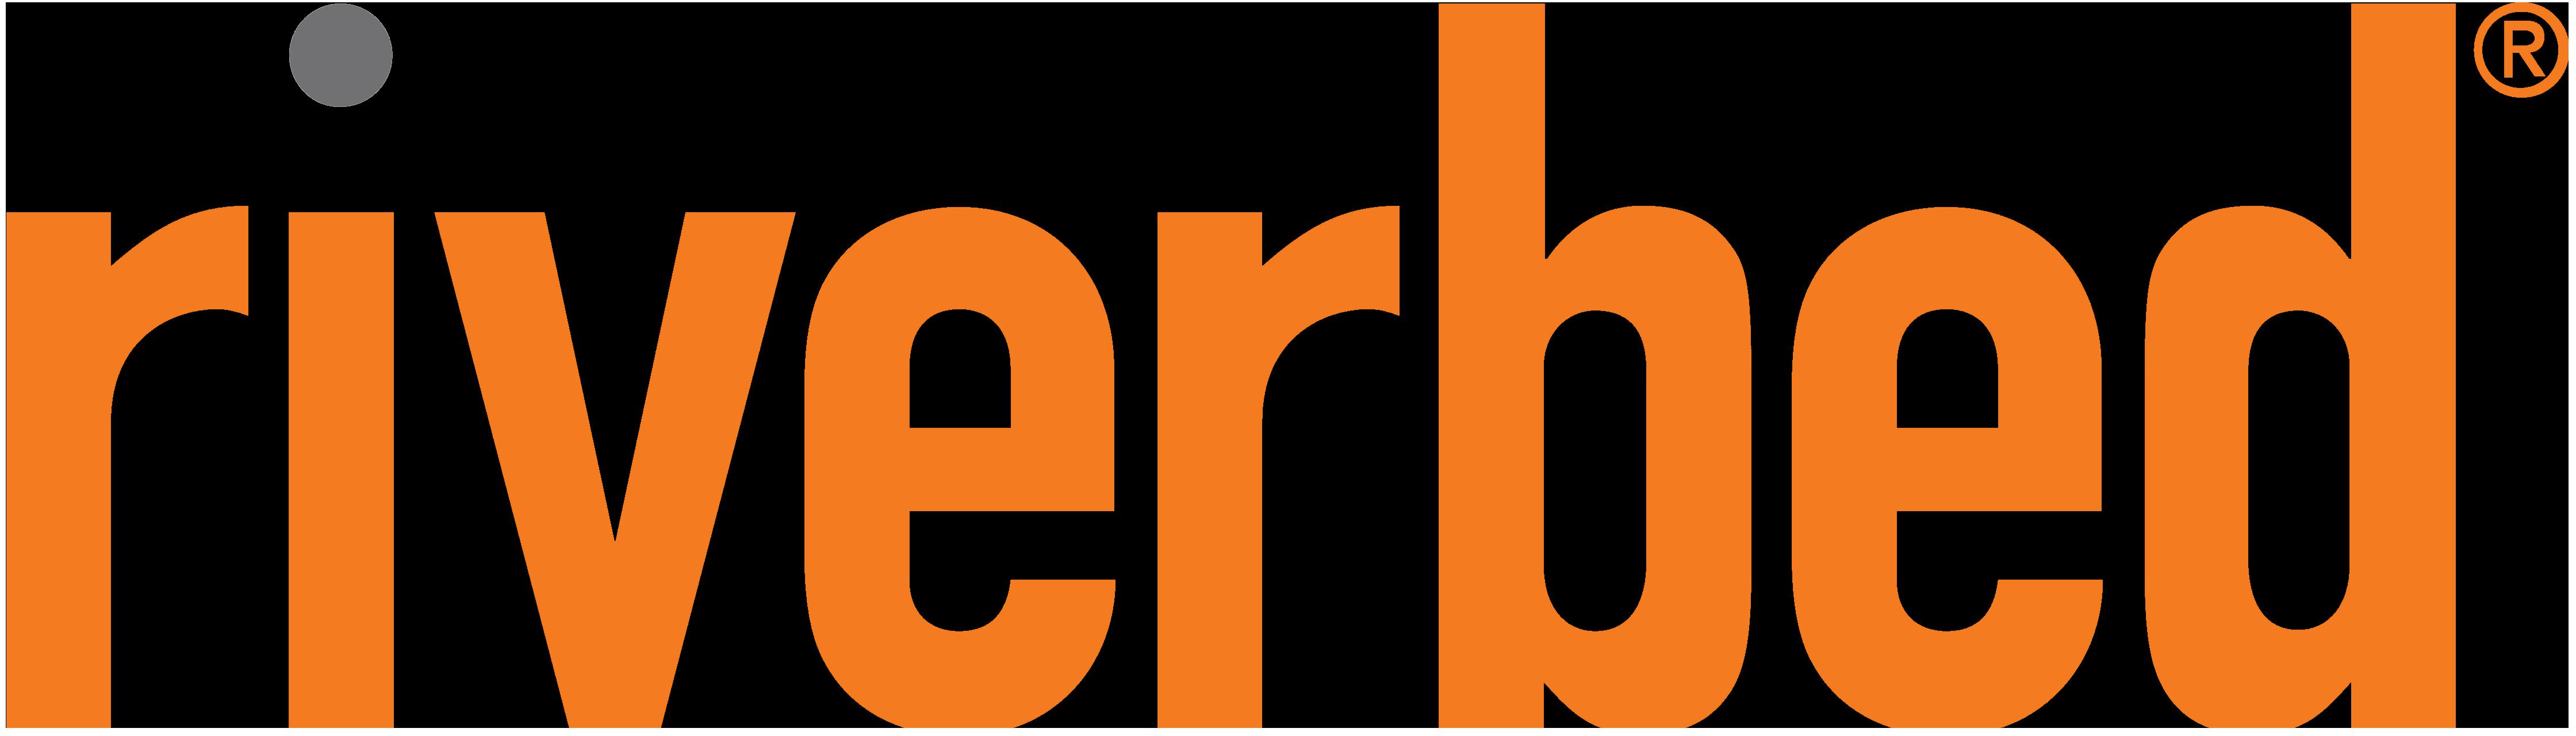 generic name viagra india